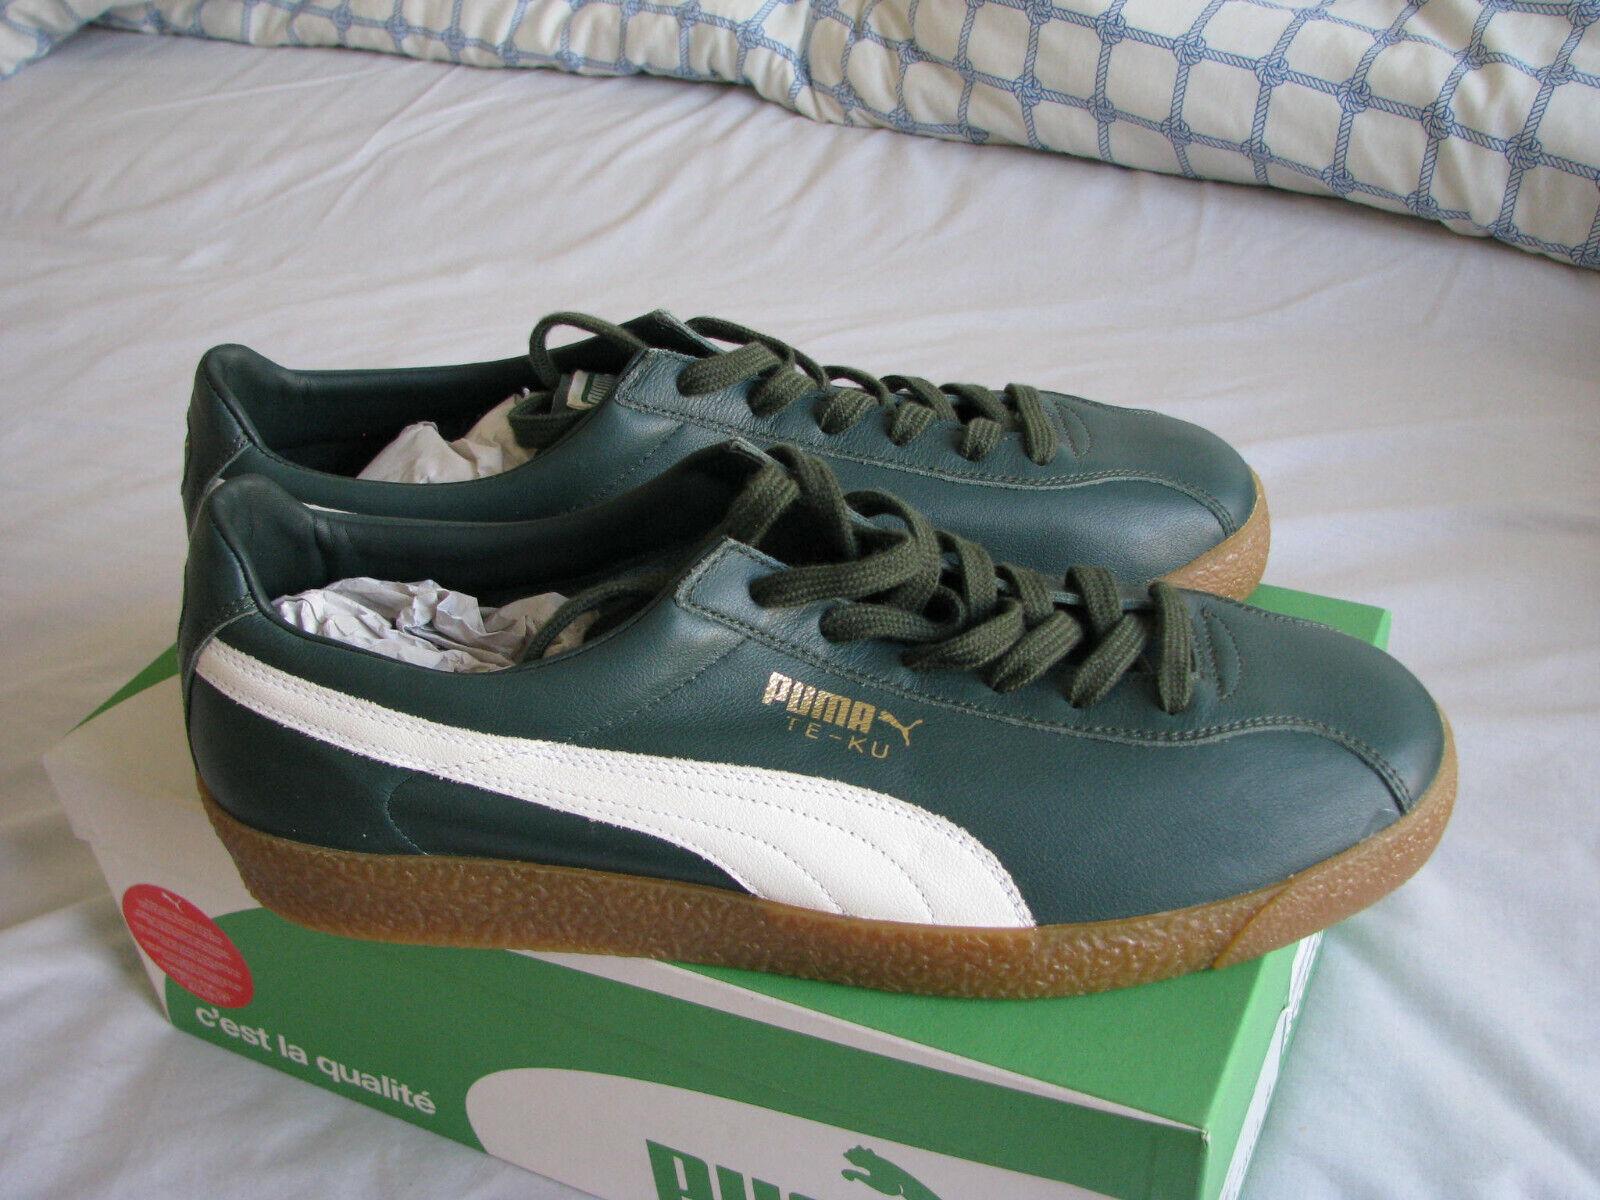 Puma Te-Ku Leather Green Lace Up Low Top Mens Trainers 365814 01 U4